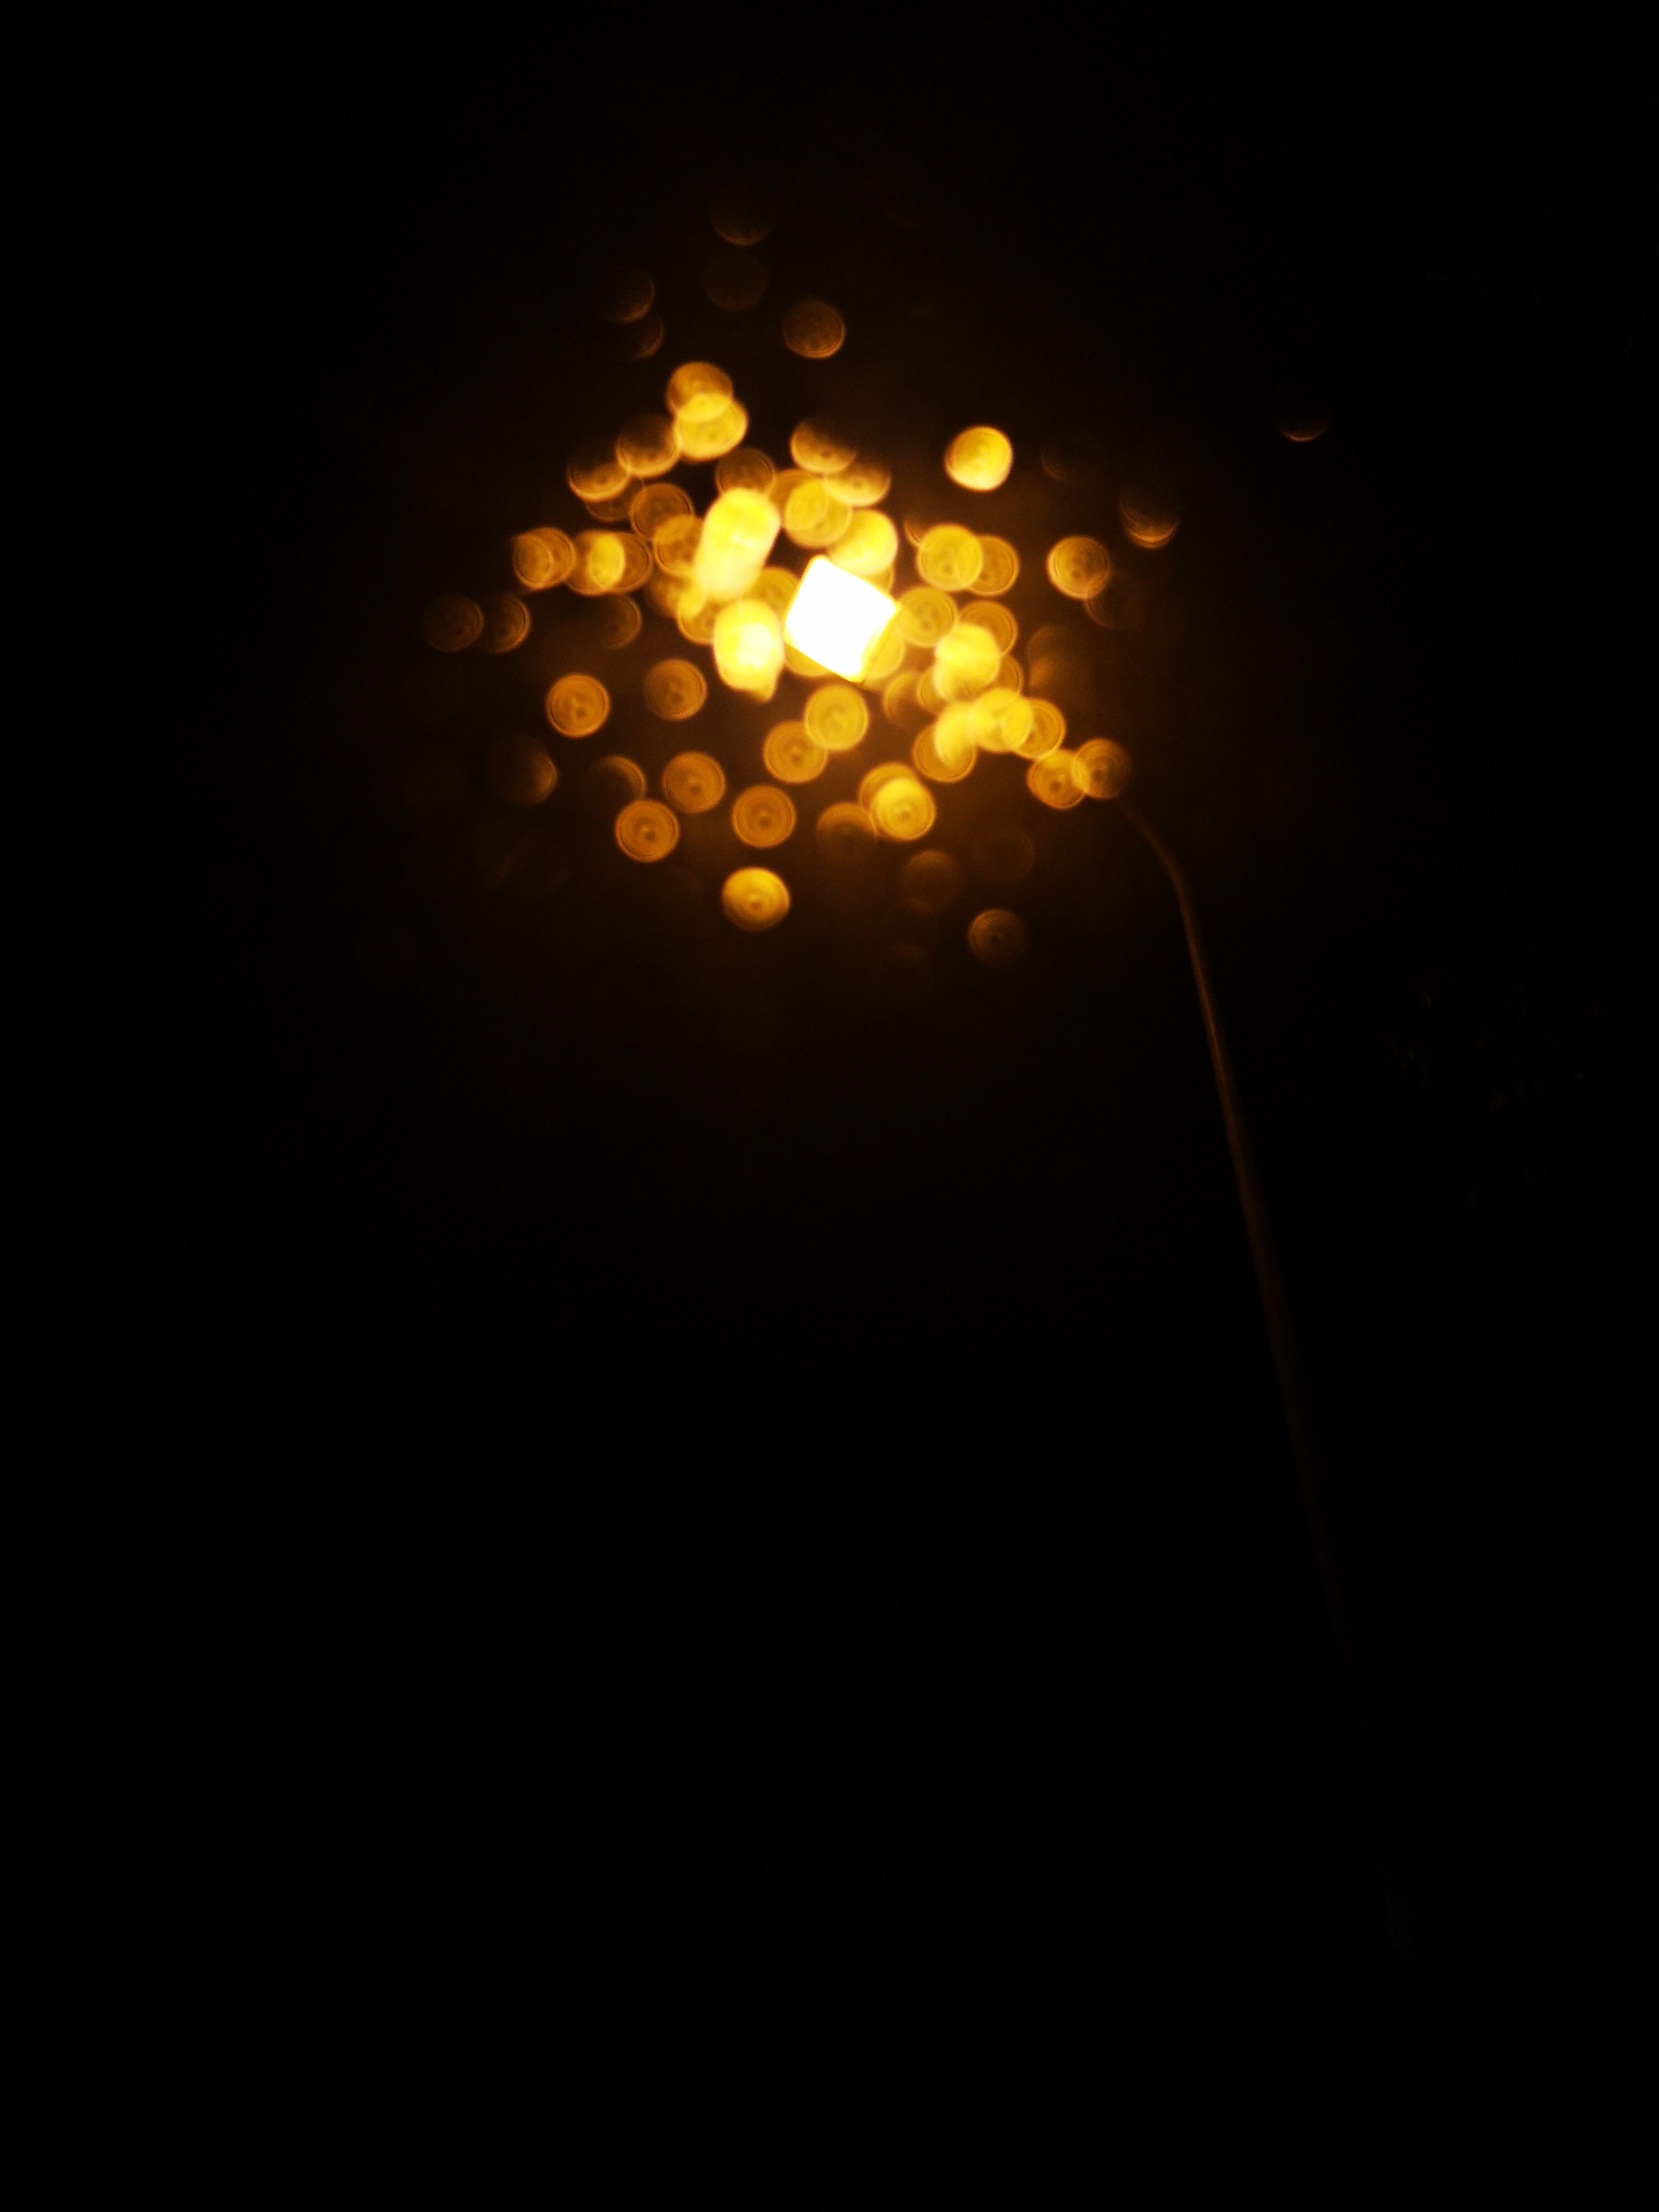 Wallpaper Street Light Lamp Dark Black 3840x5120